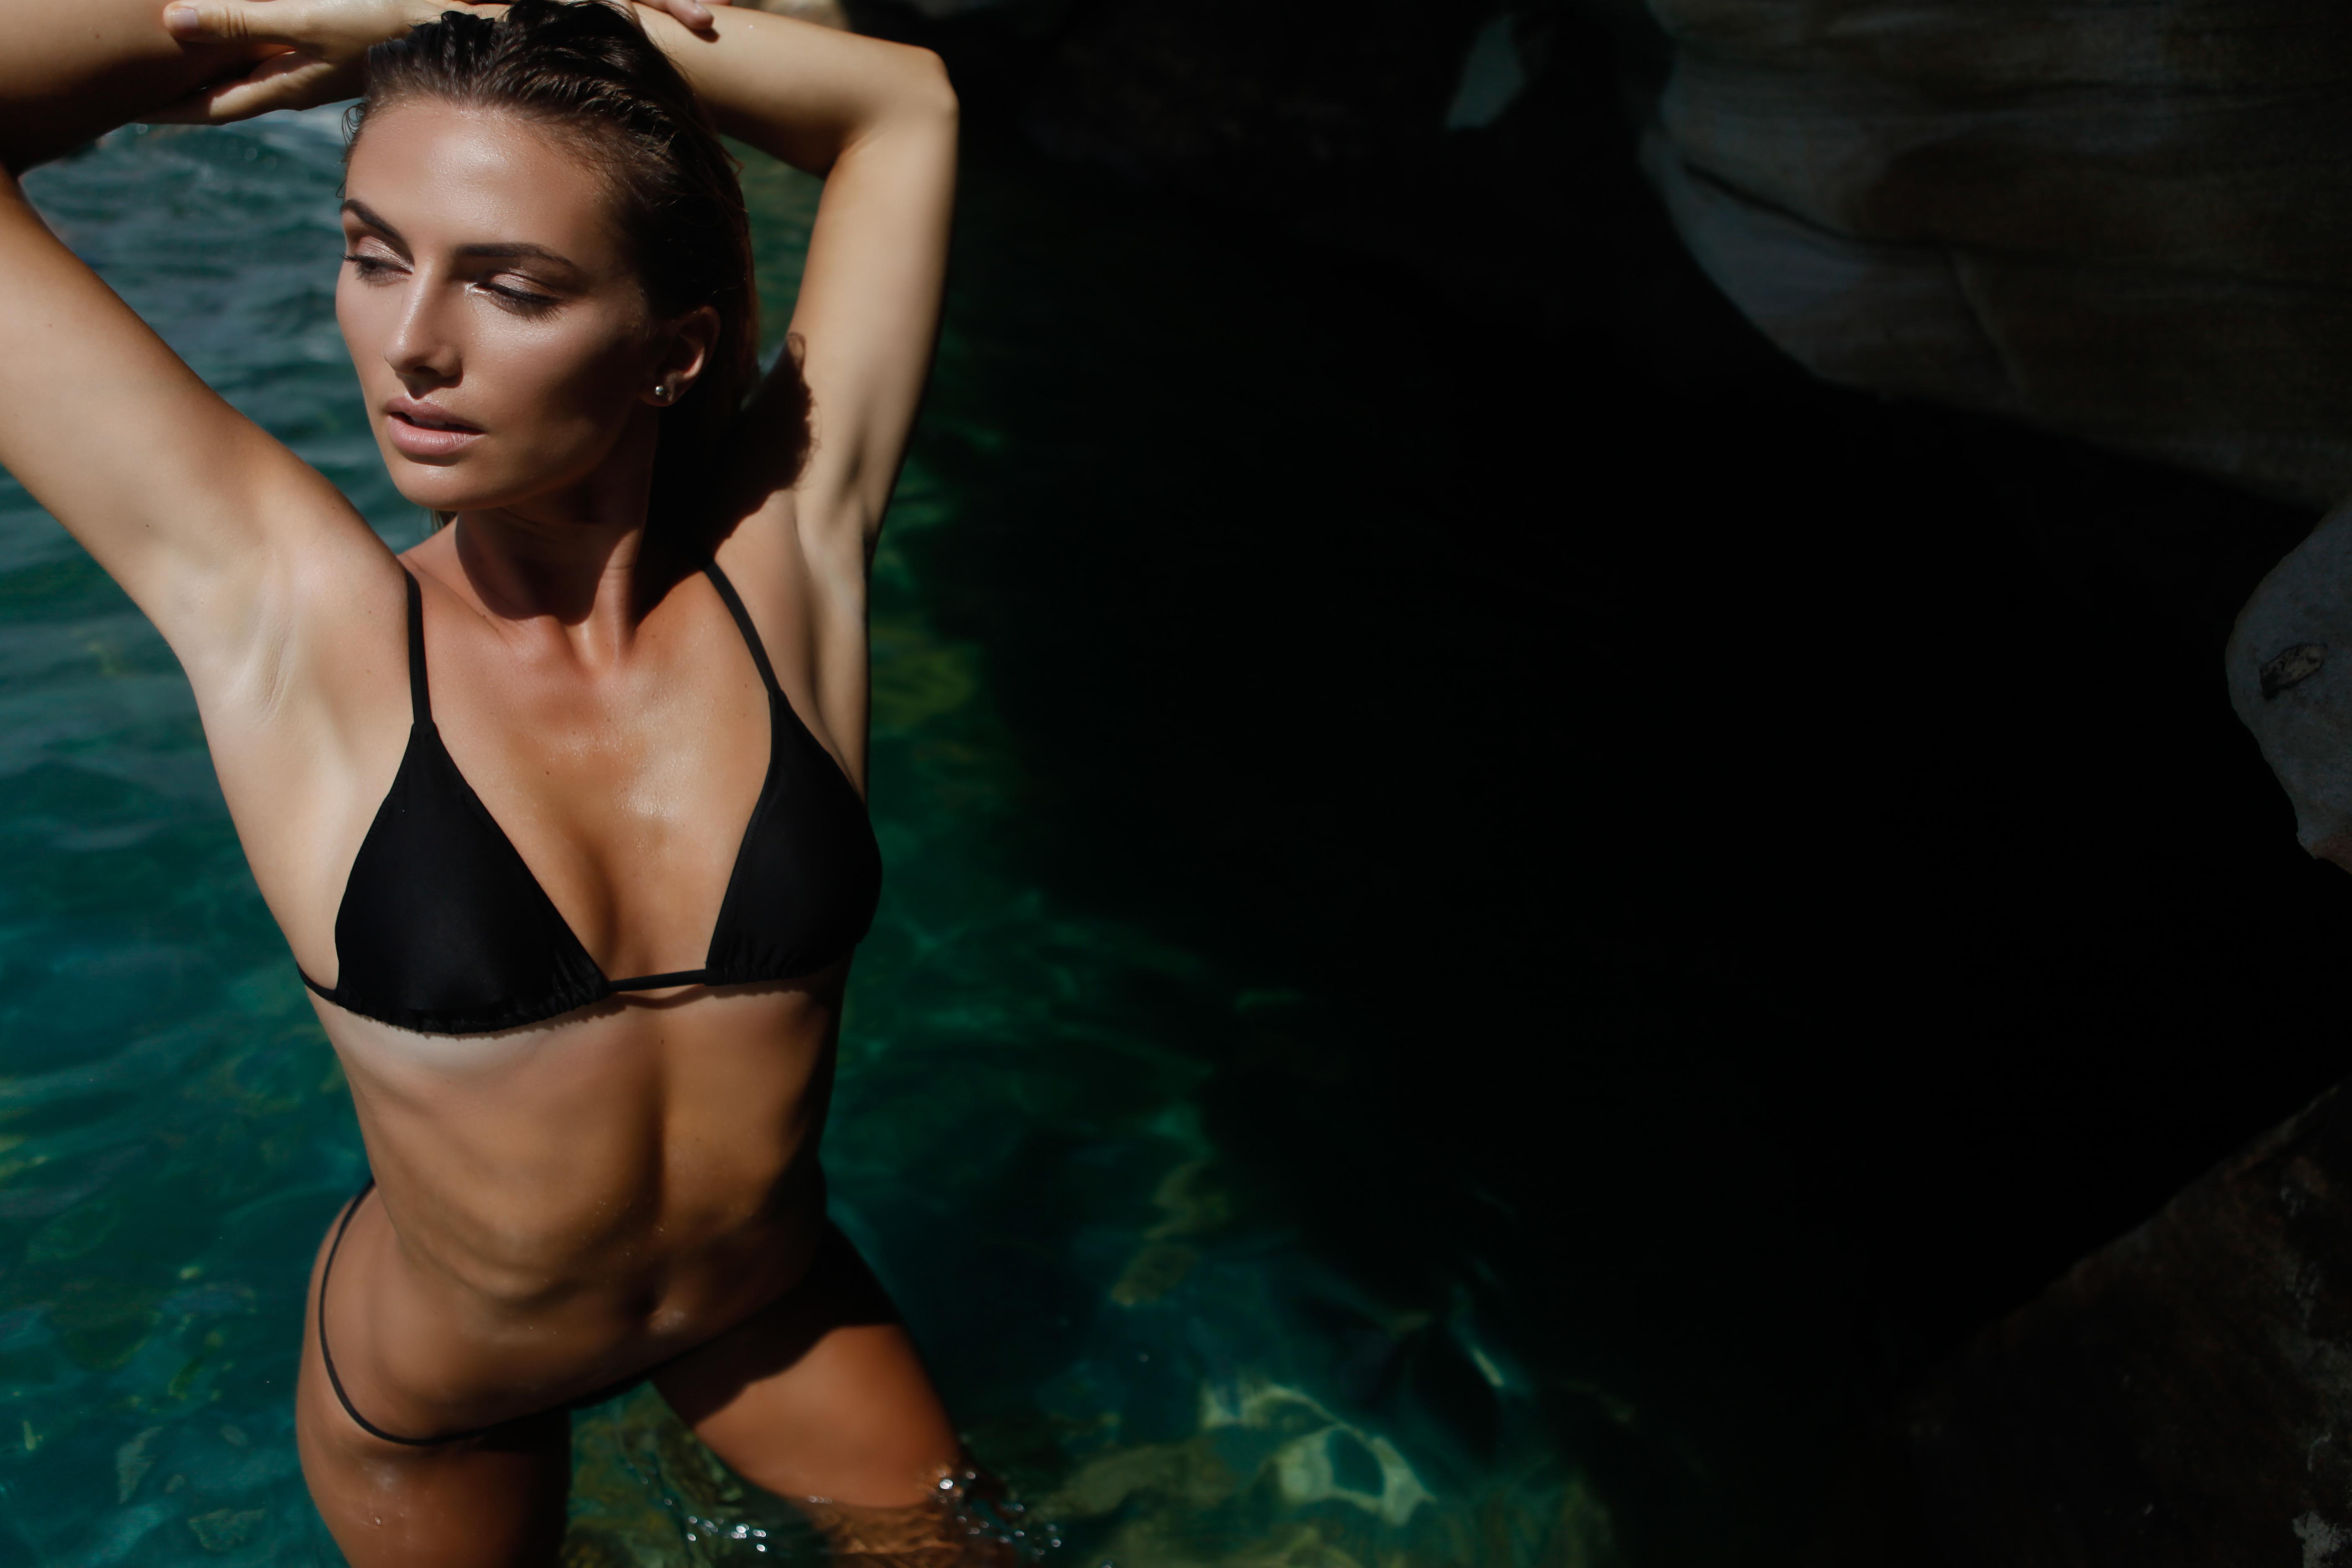 Bikini Oceana Strachan nudes (39 photo), Sexy, Fappening, Boobs, butt 2020